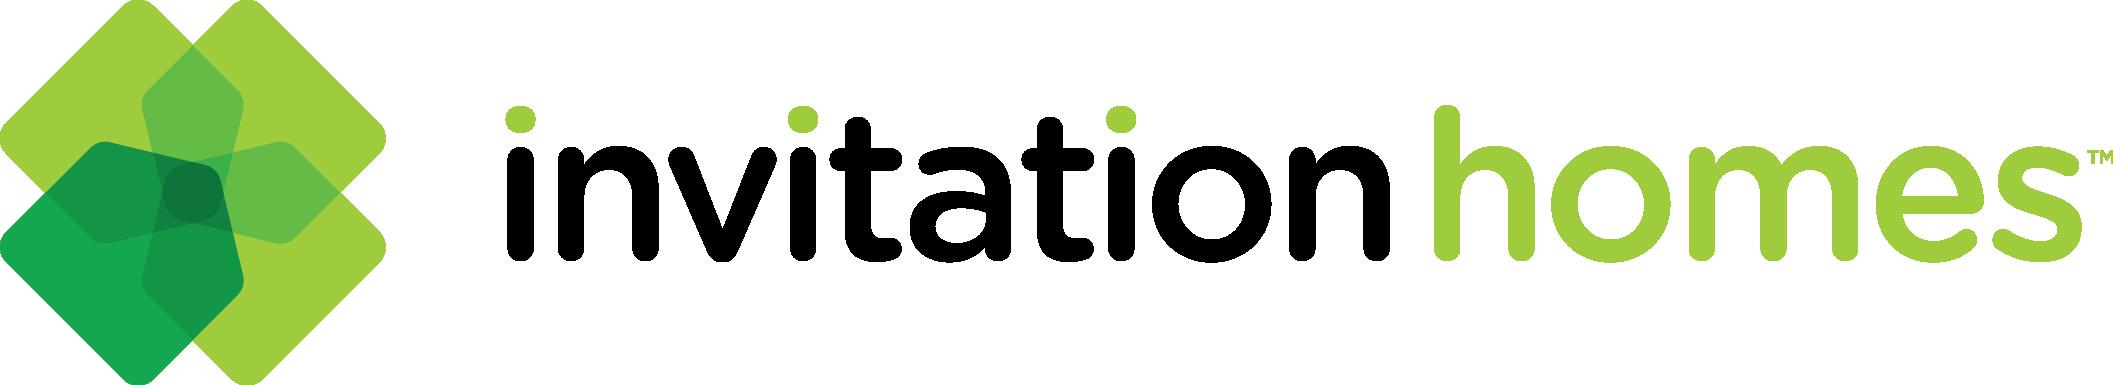 Invitation Home logo